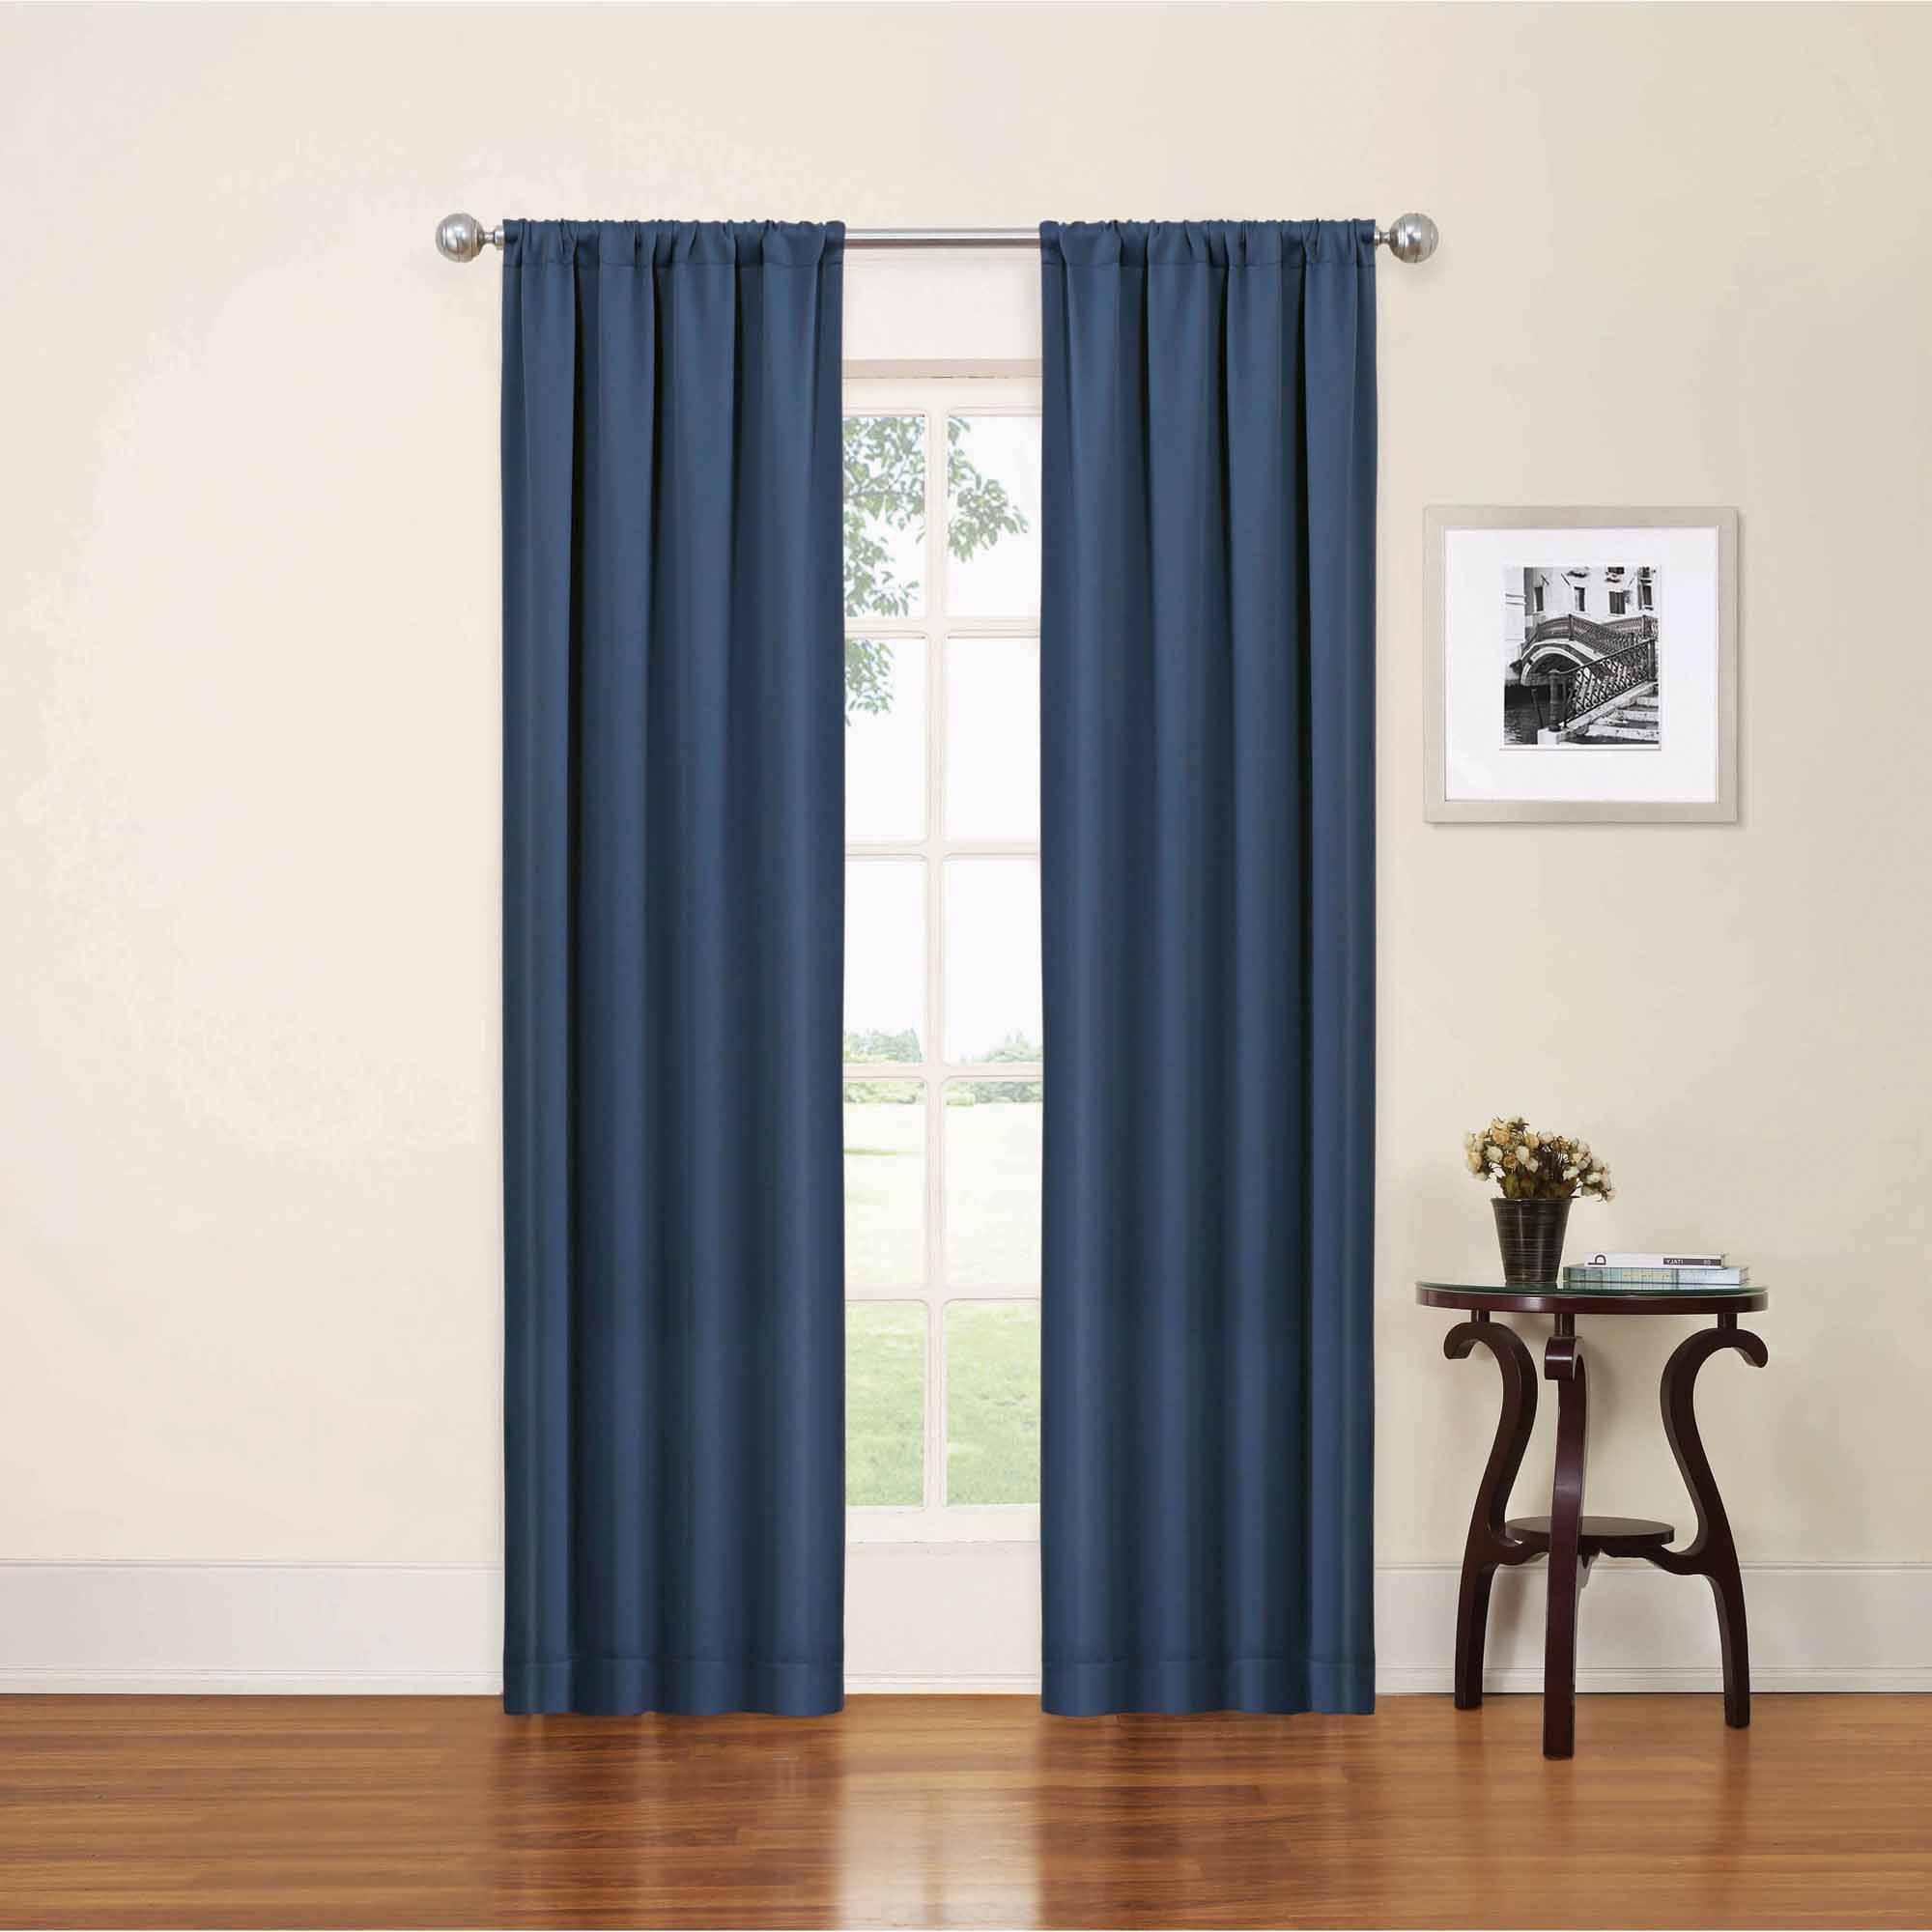 Eclipse Phoenix Blackout Window Curtain Panel Pair Regarding Well Known Room Darkening Window Curtain Panel Pairs (Gallery 12 of 20)